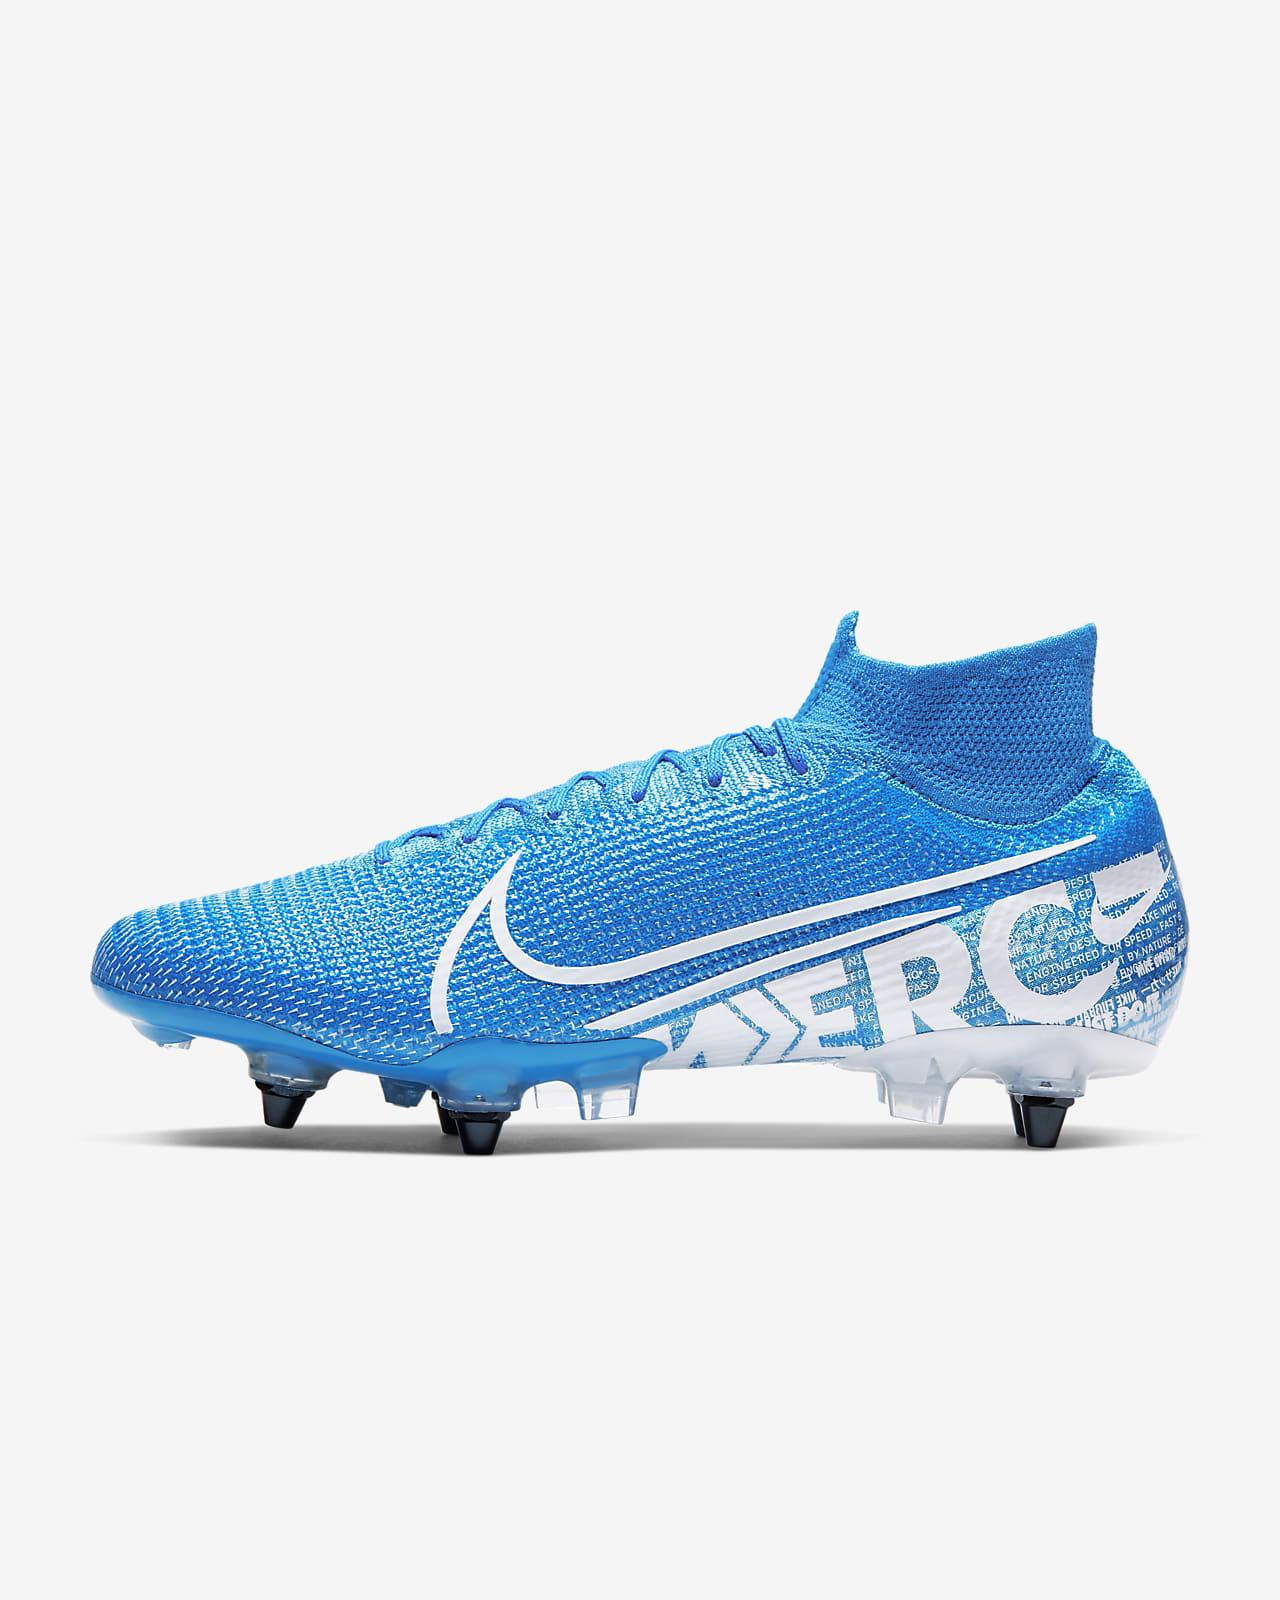 Футбольные бутсы для игры на мягком грунте Nike Mercurial Superfly 7 Elite SG-PRO Anti-Clog Traction